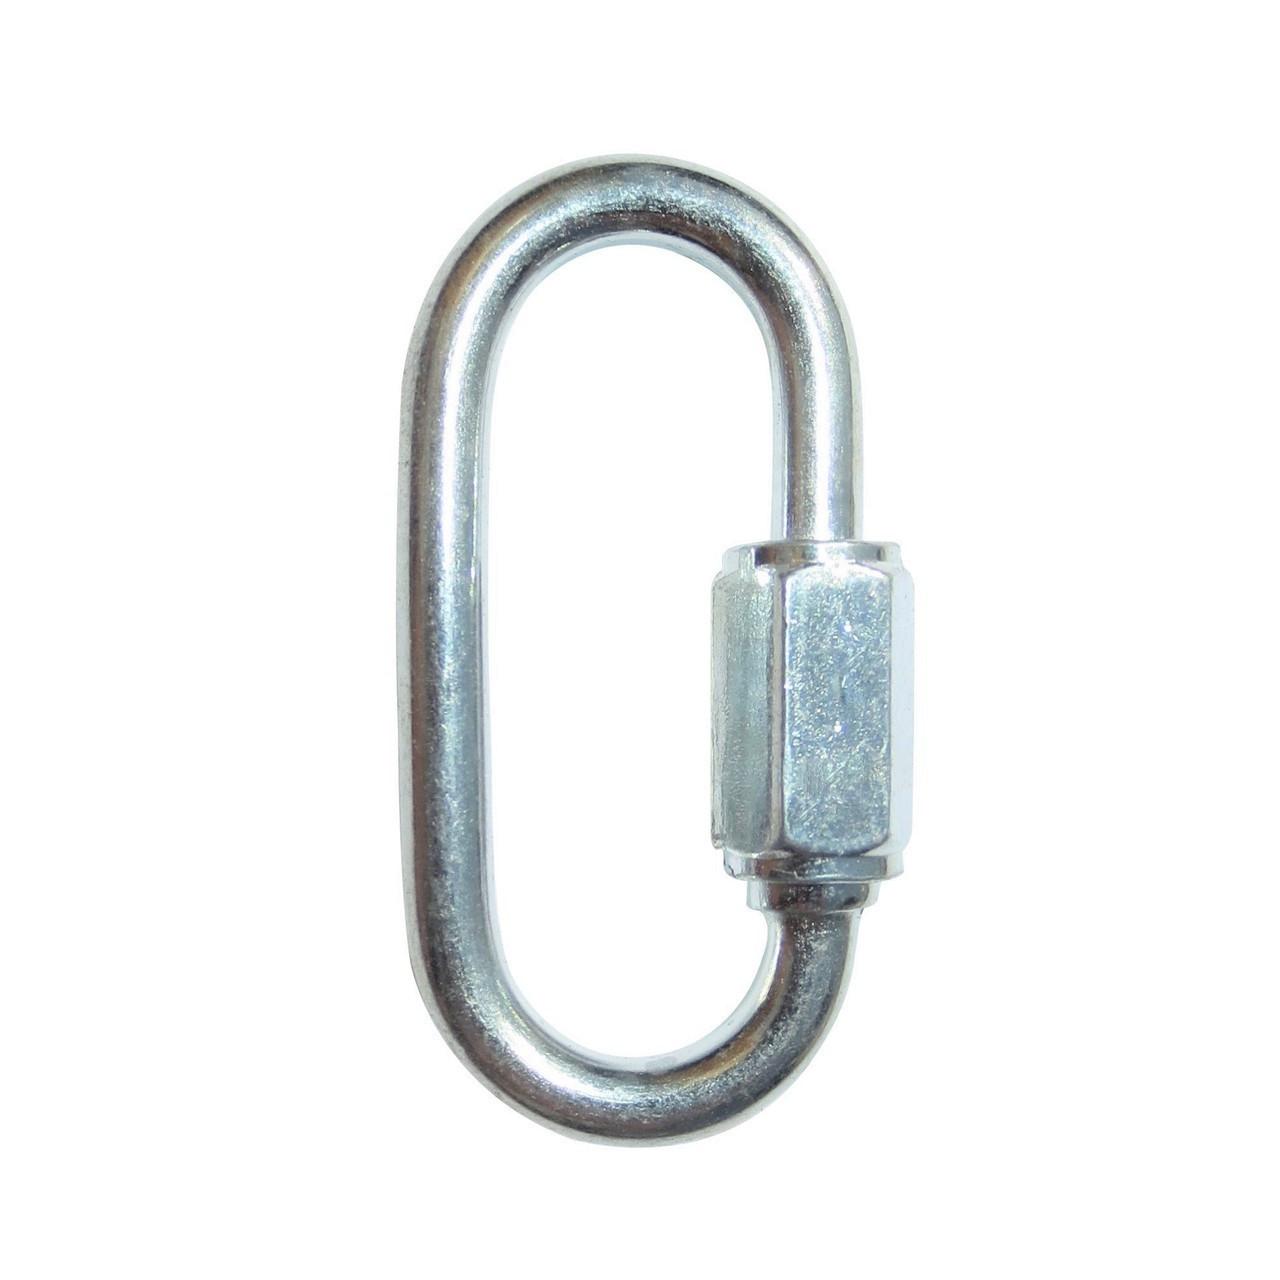 Quick Links - 4.0mm - Zinc Plated